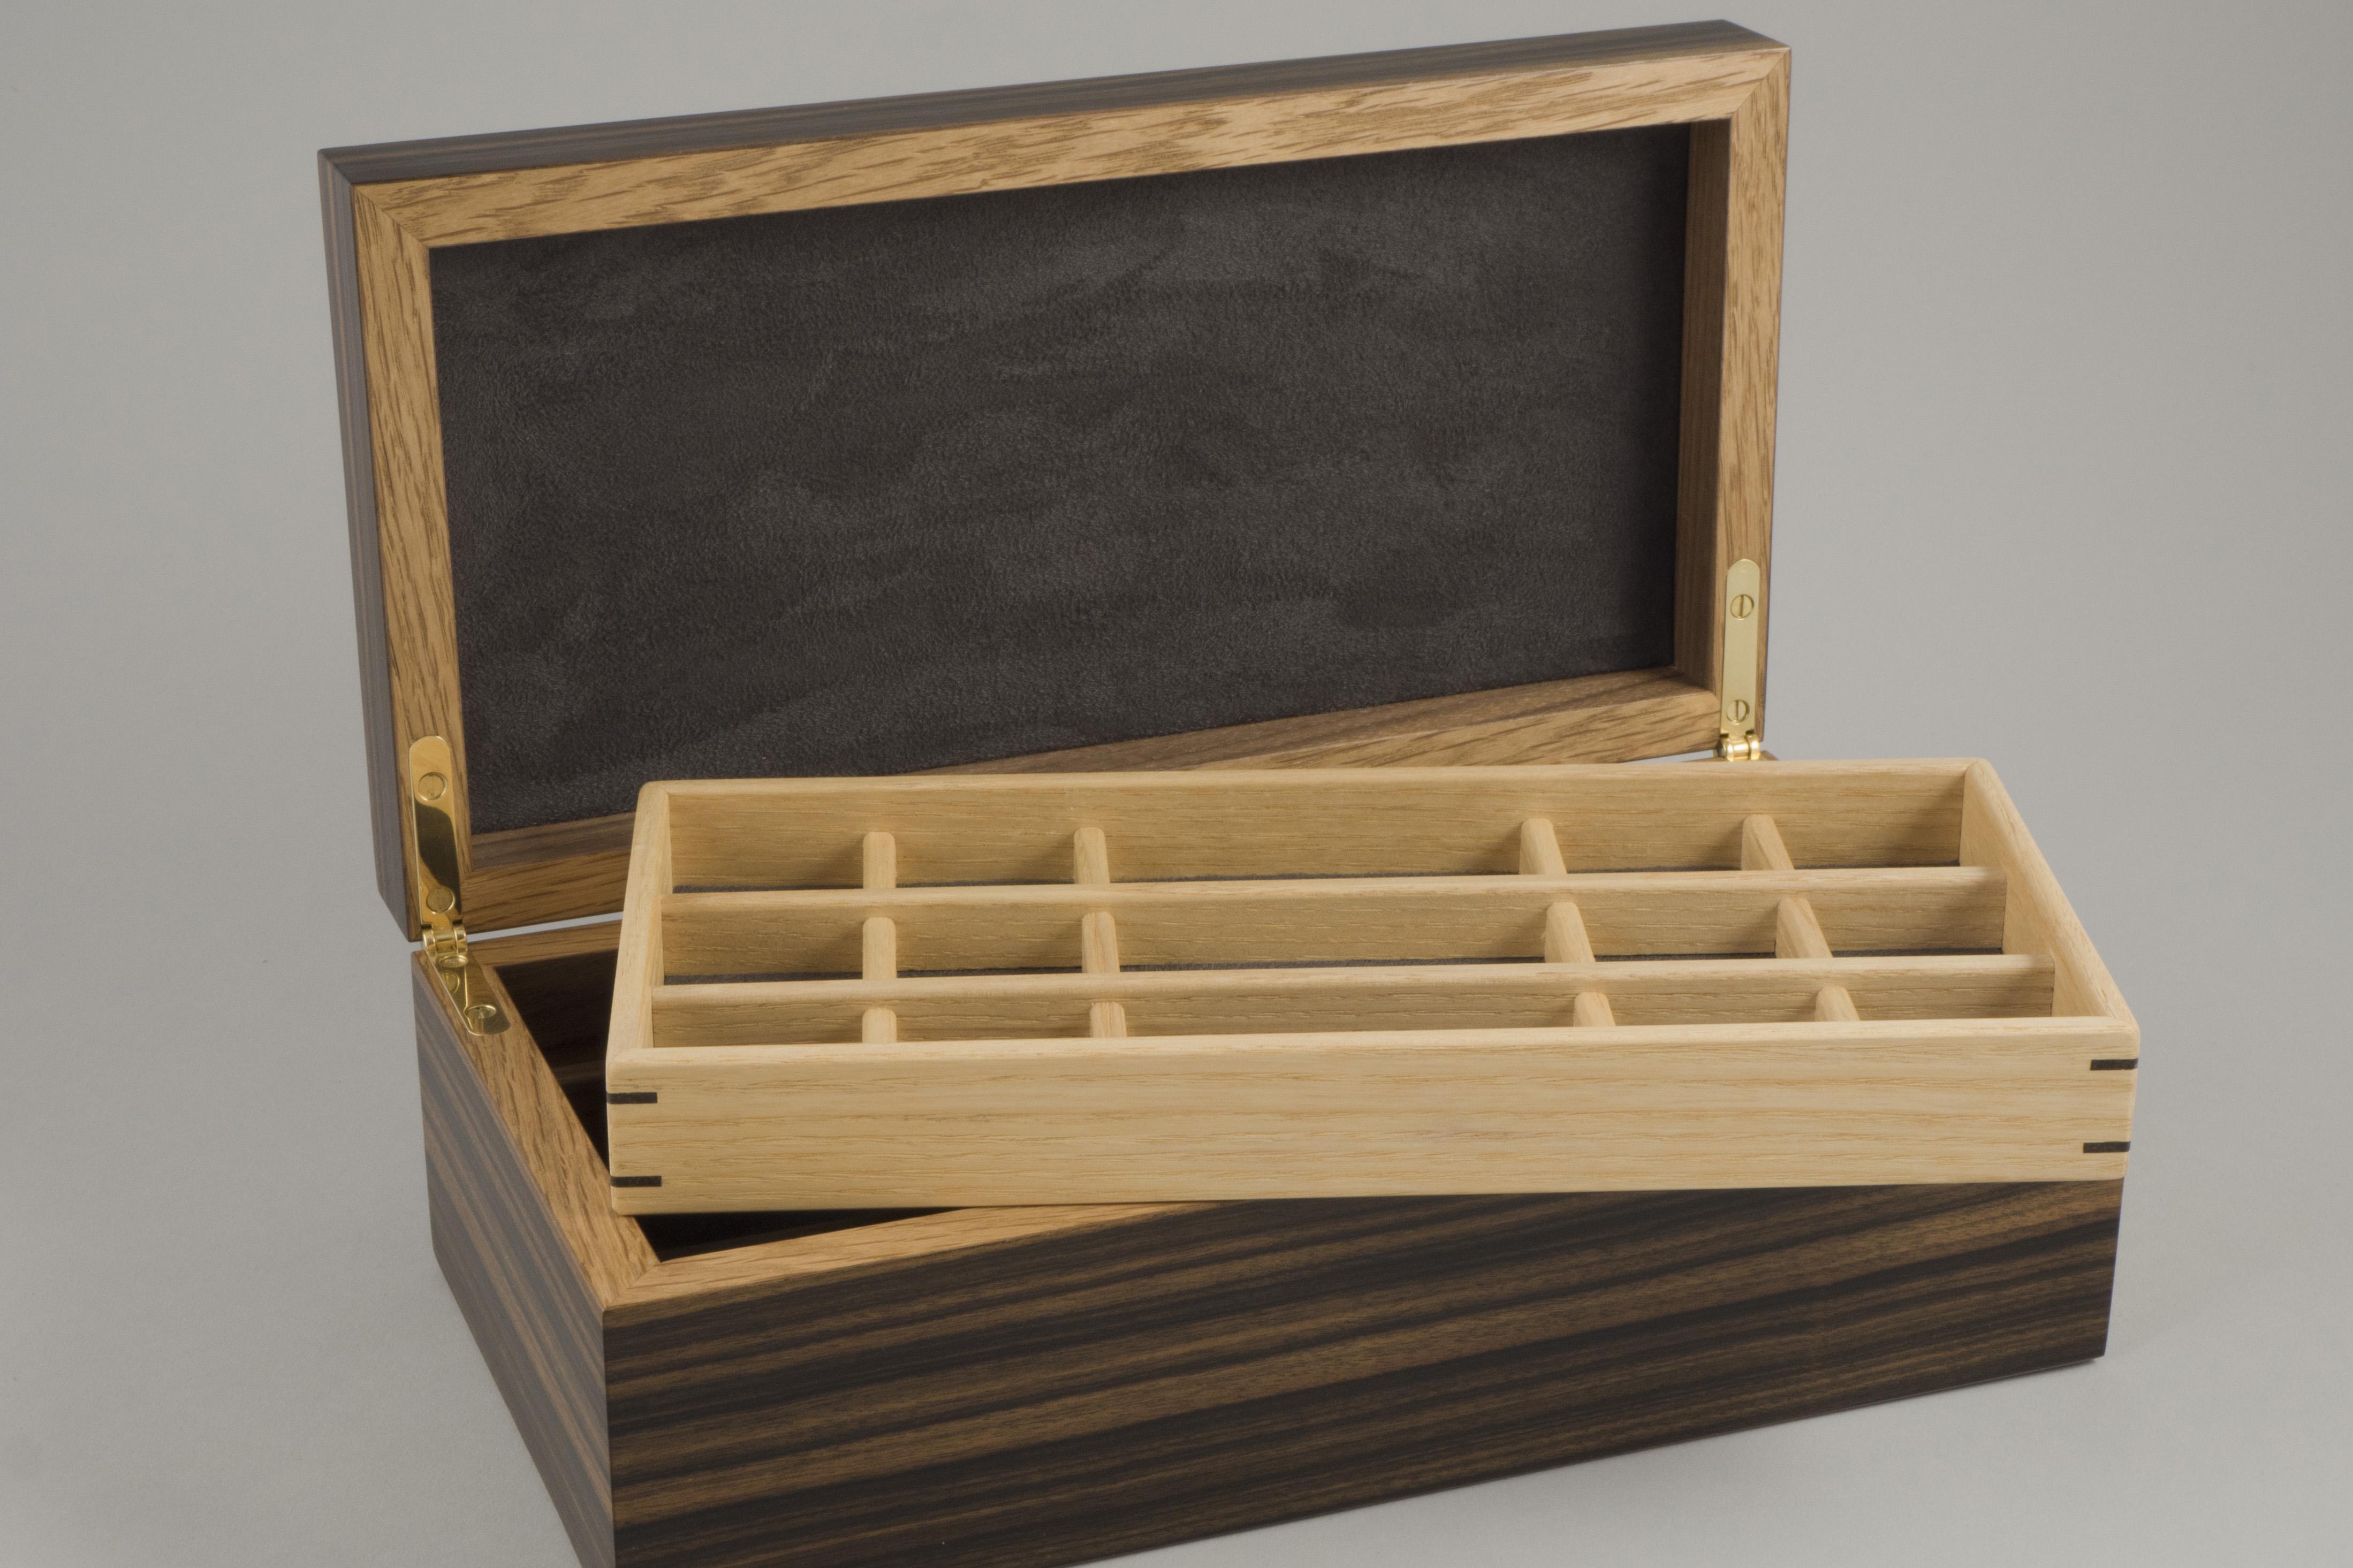 Macassar ebony jewellery box